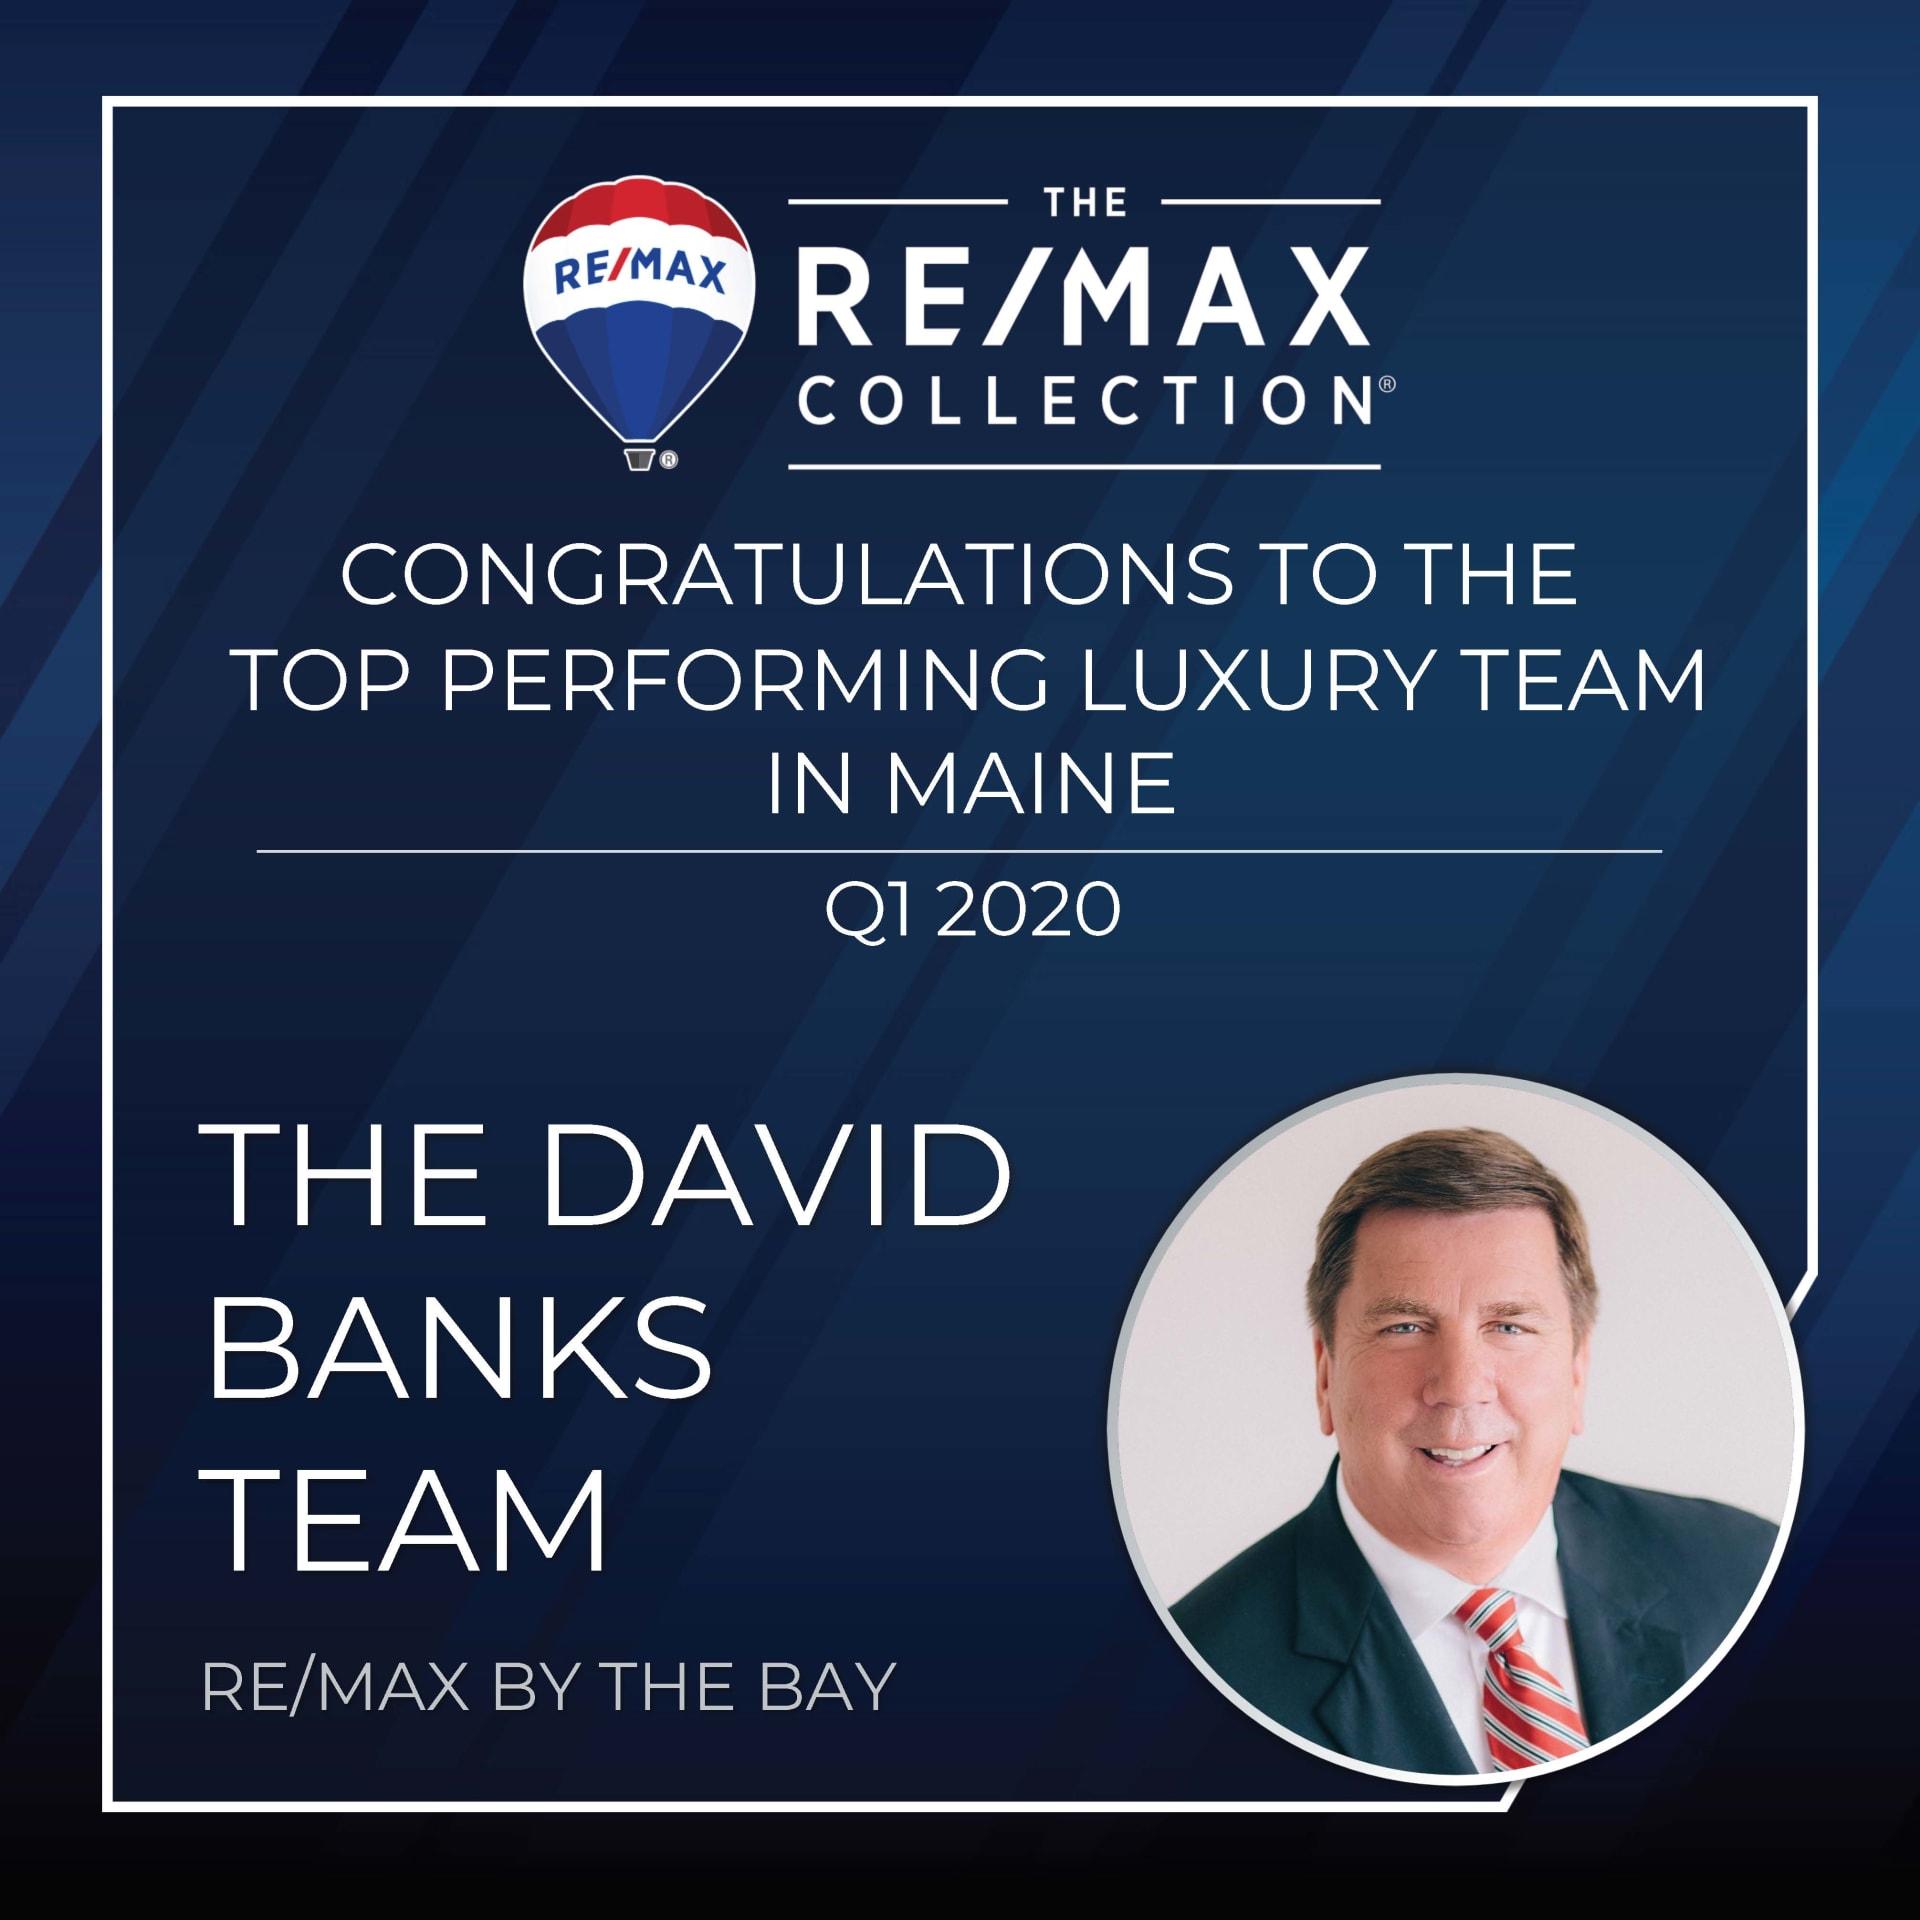 Top Performing Luxury Team in Maine